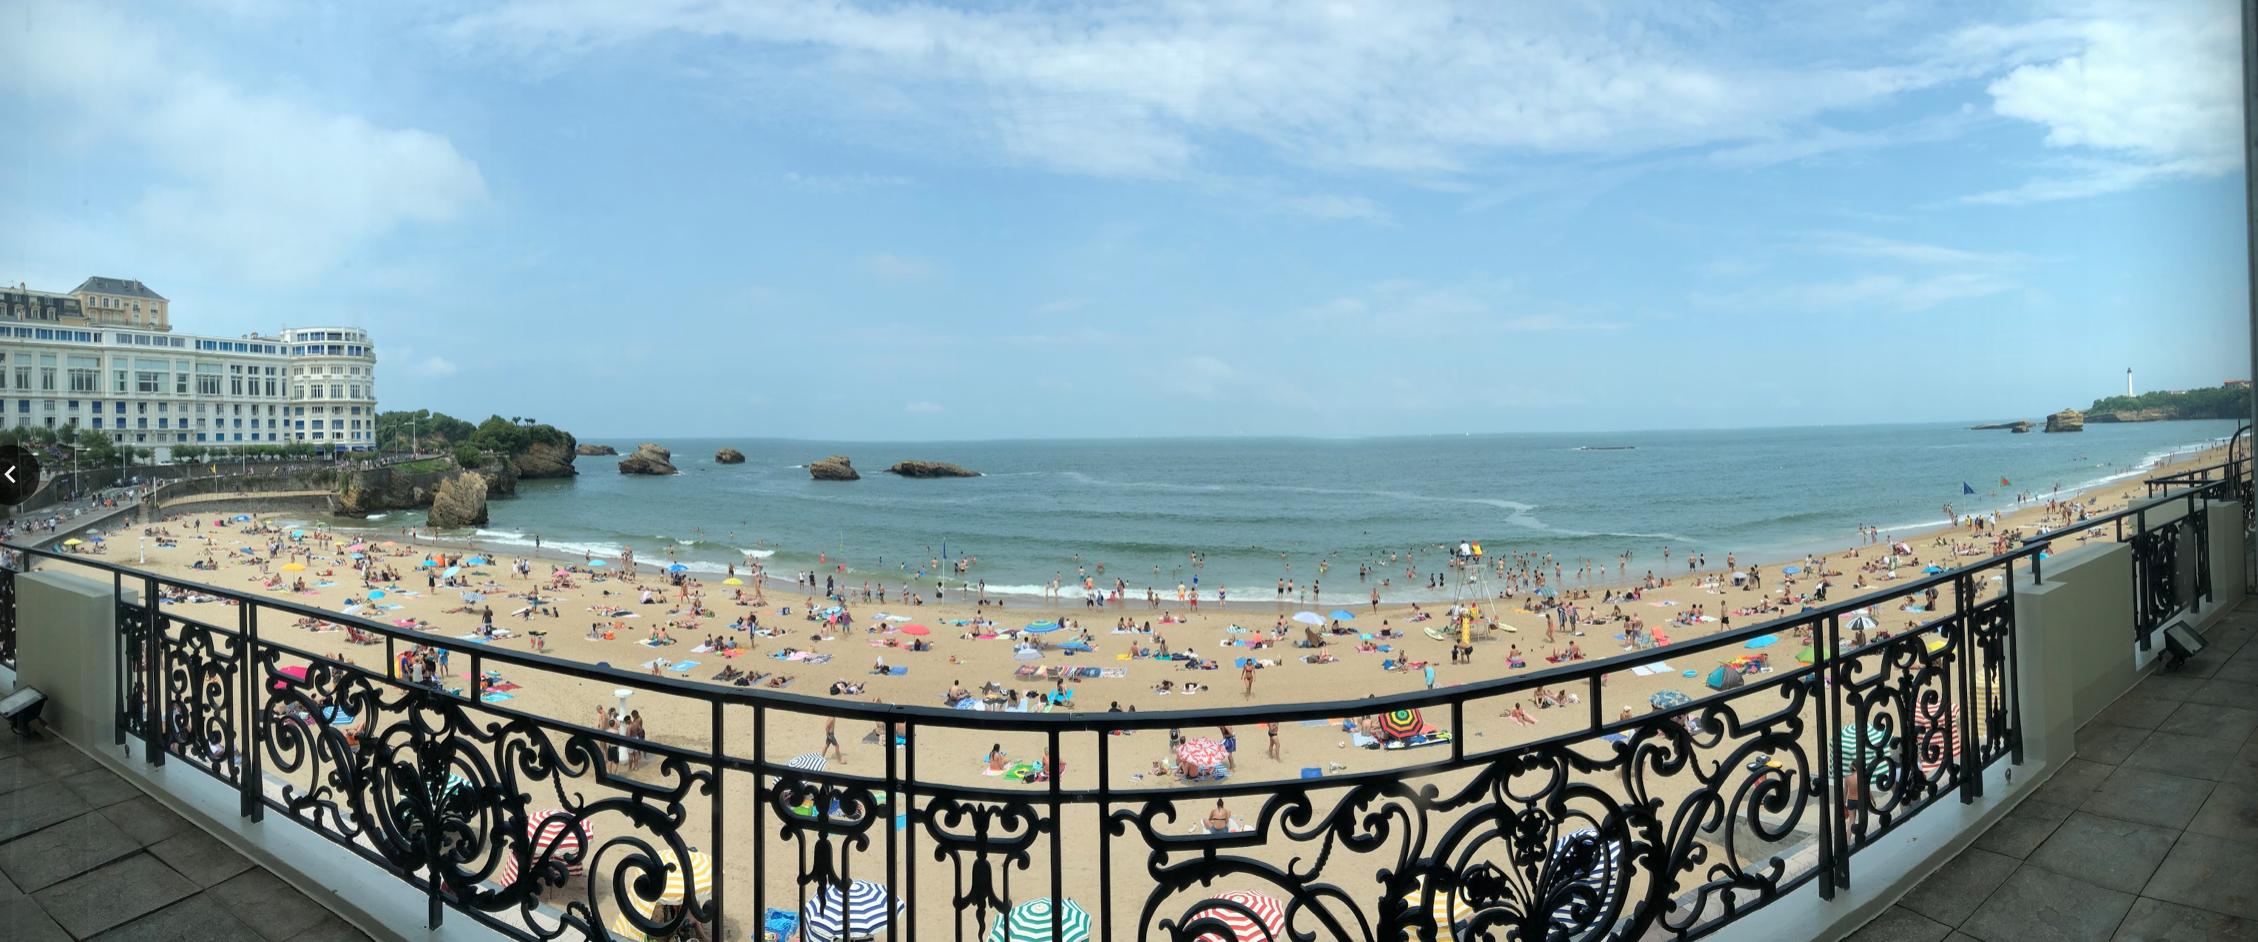 Panorama of Beach in Biarritz France